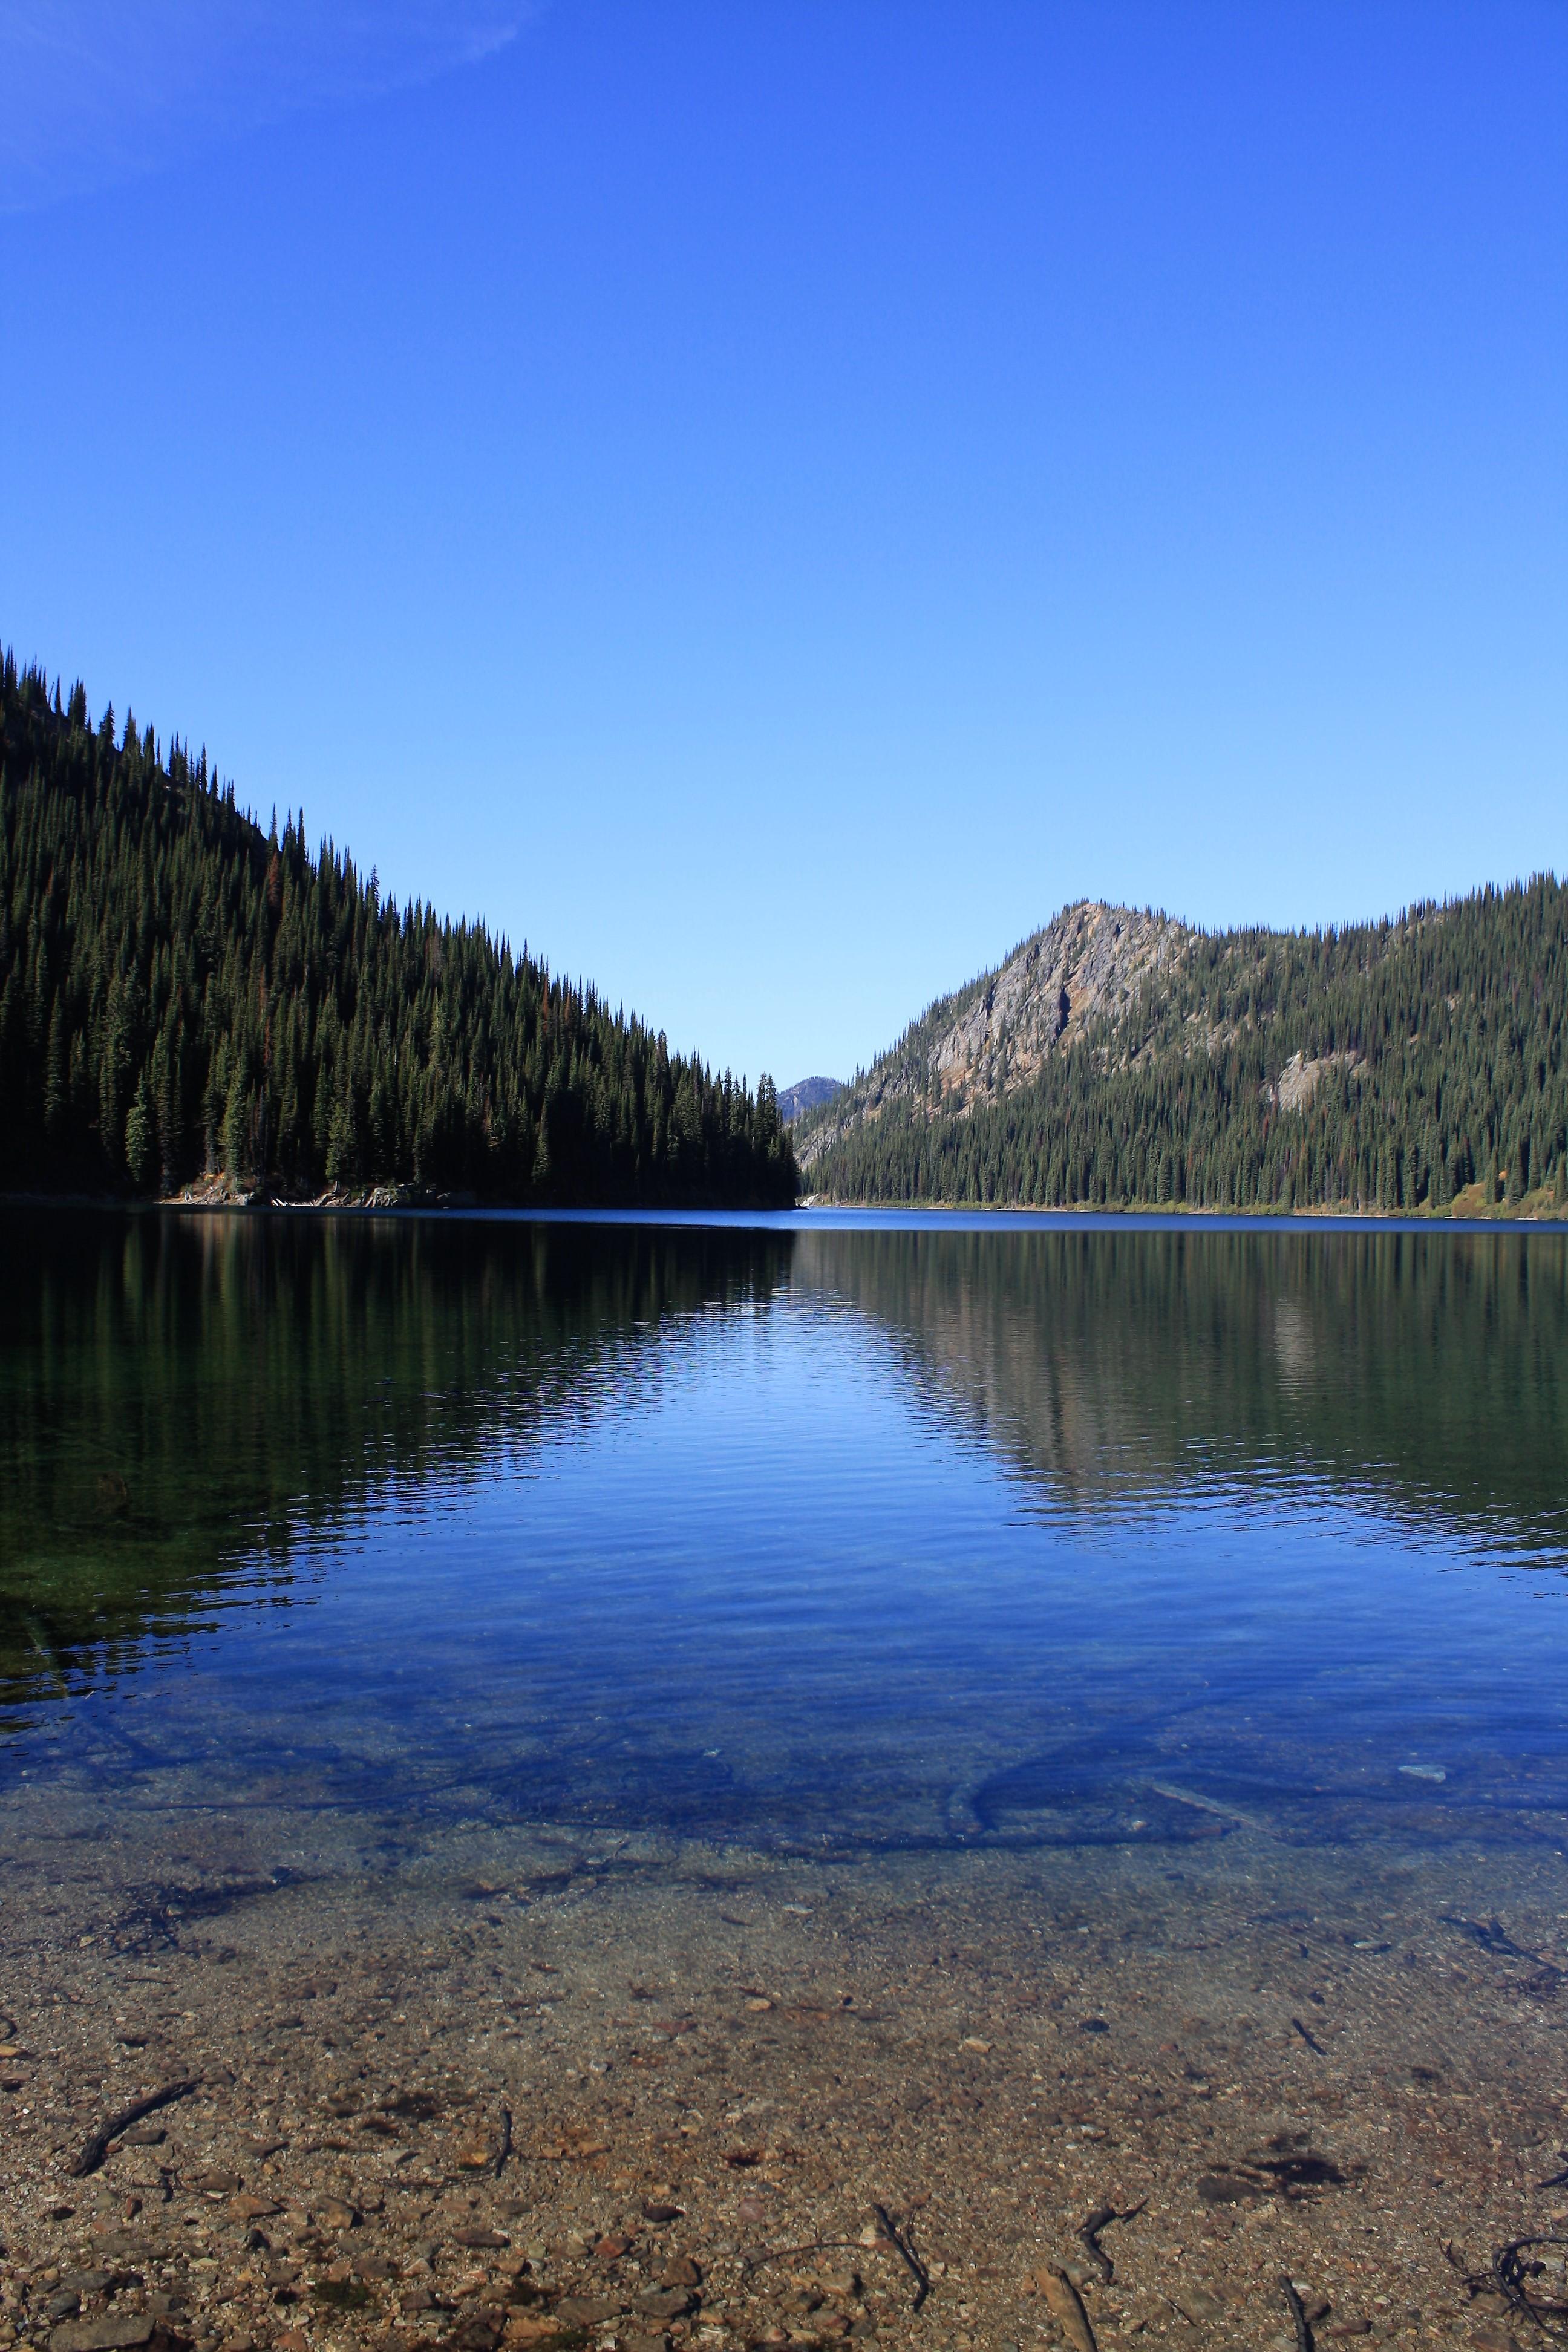 DM_nature_landscape_plaidlake_0454